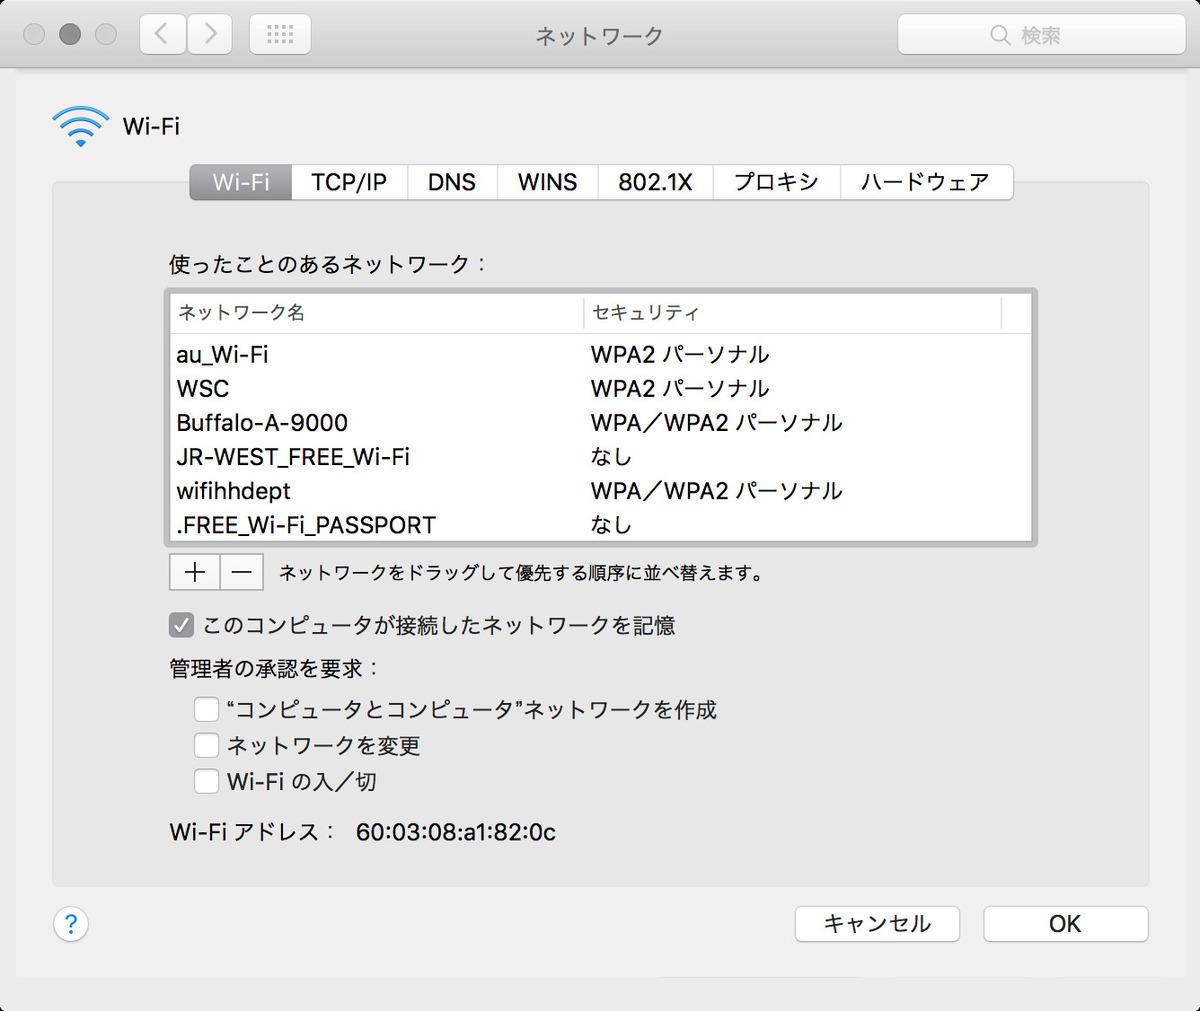 f:id:takuya_1st:20160822022644j:plain:w300